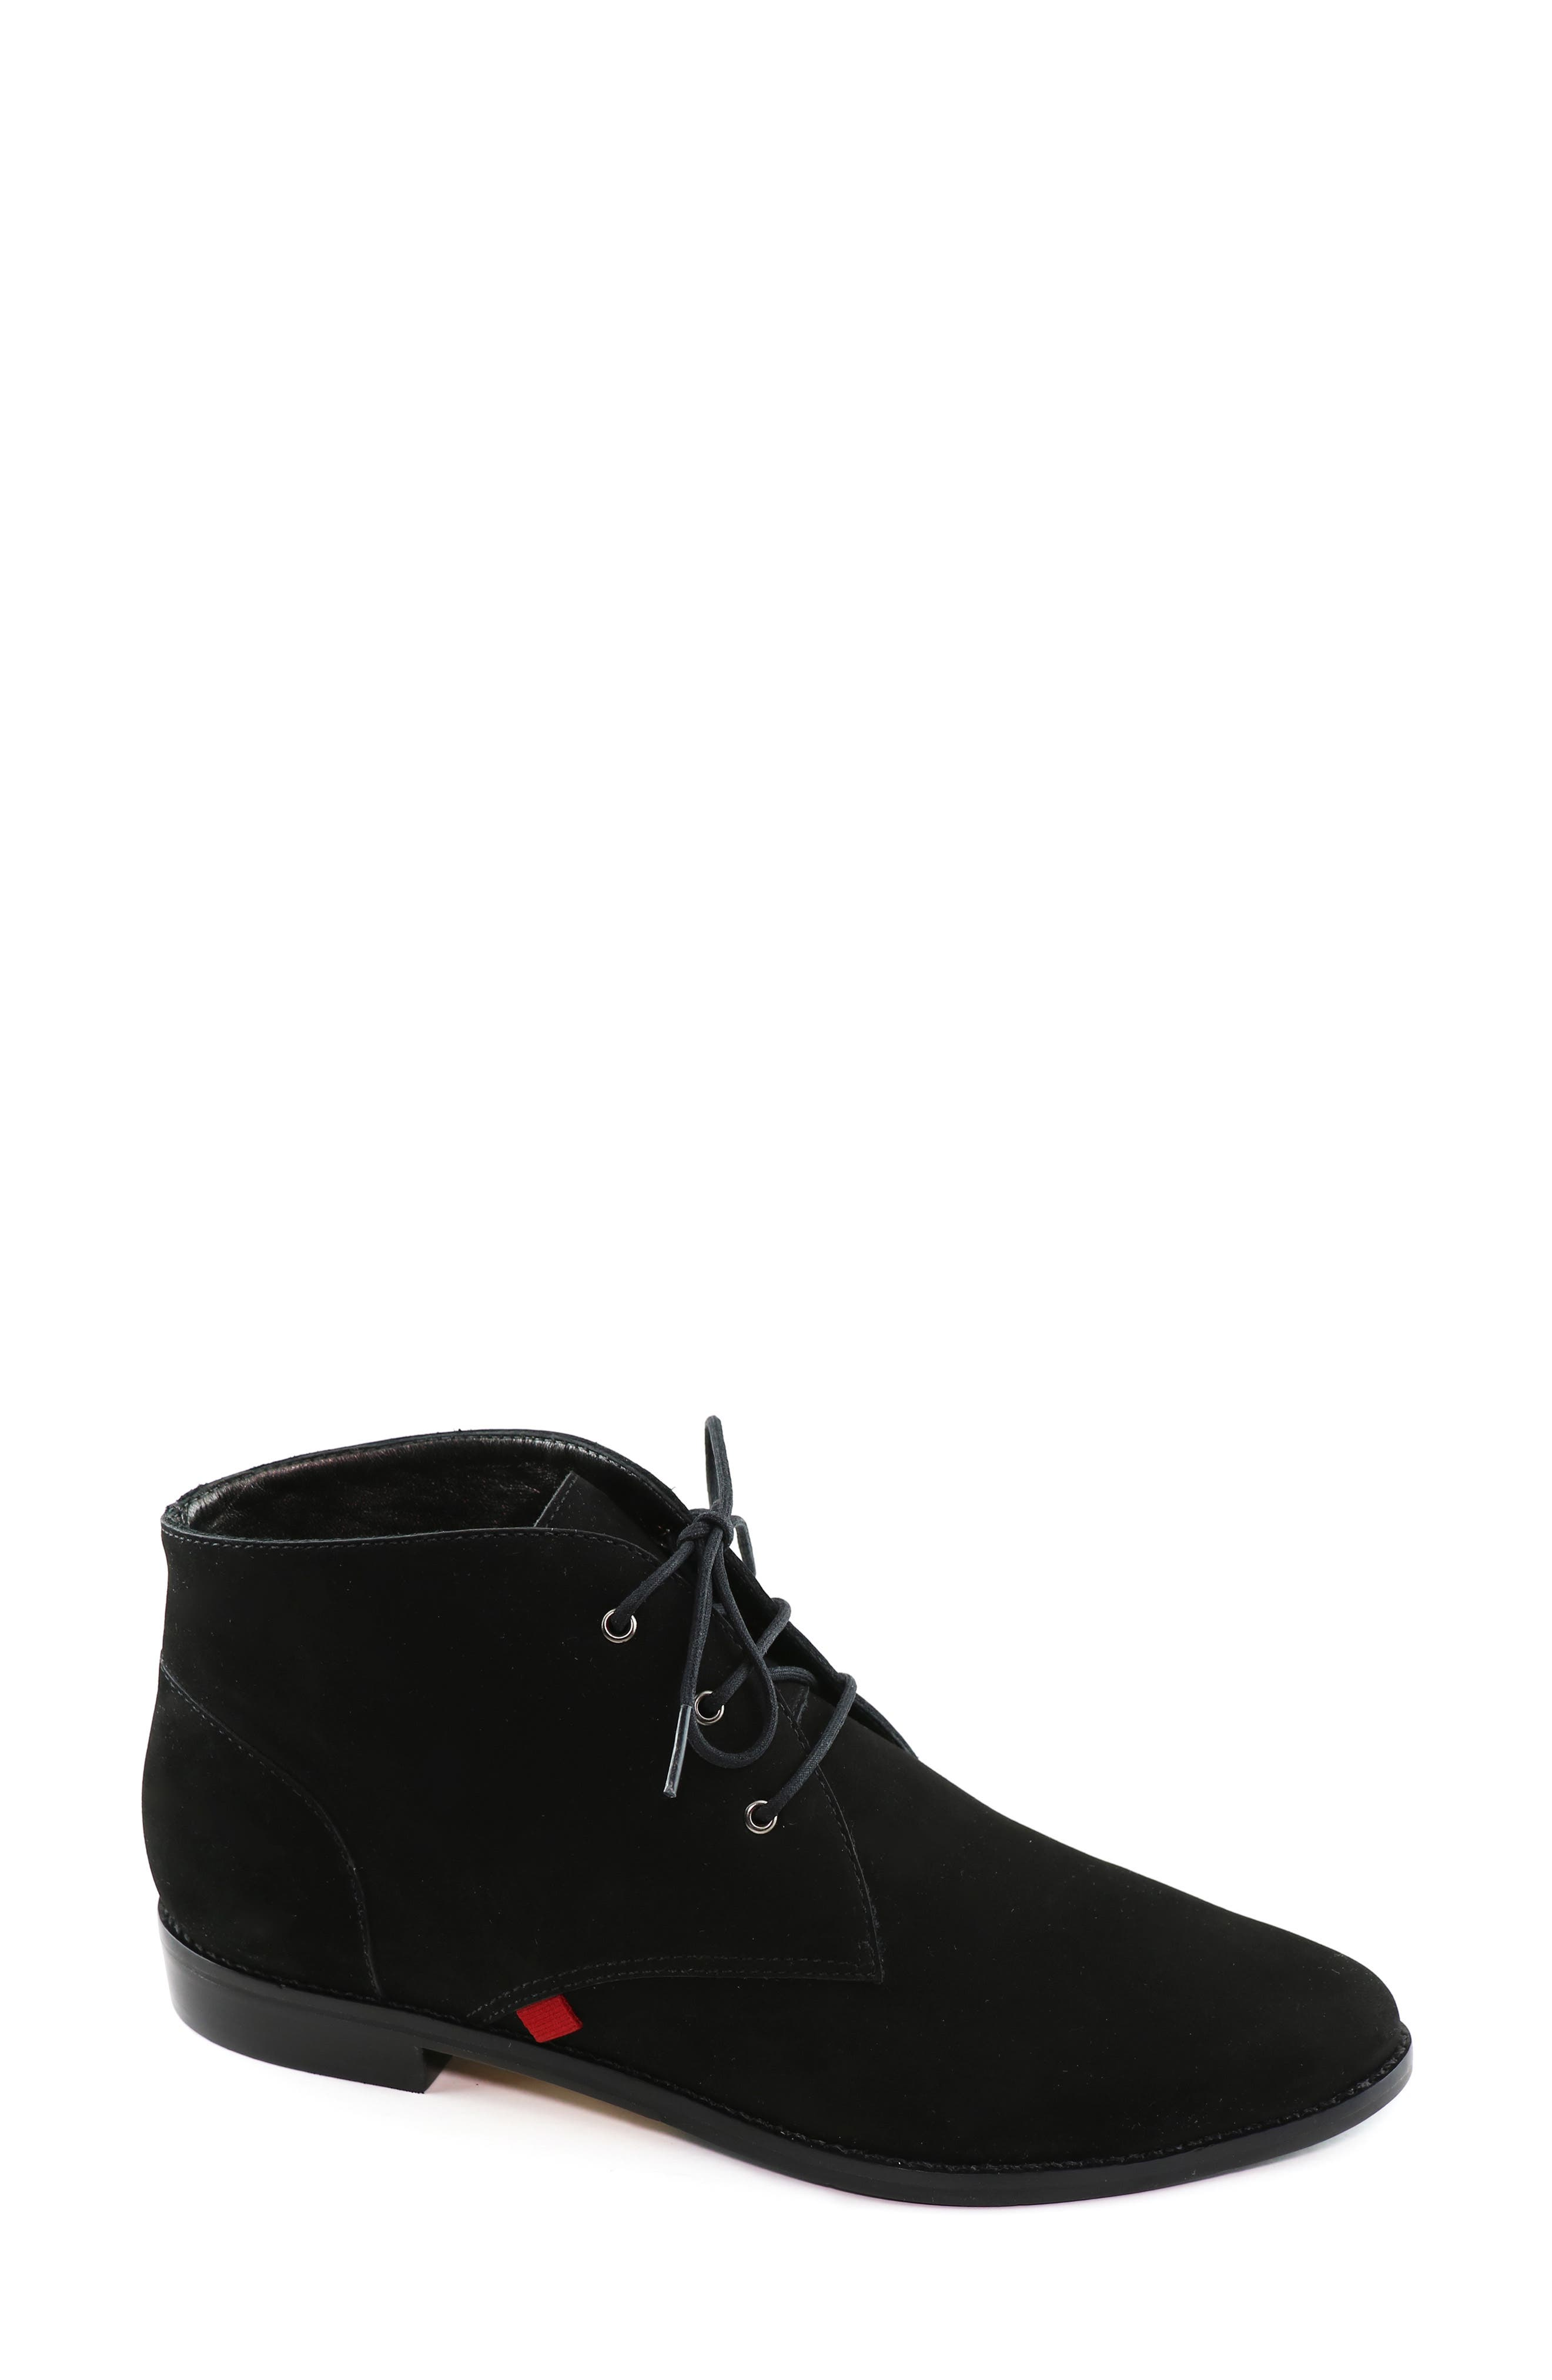 Juniper Ankle Boot